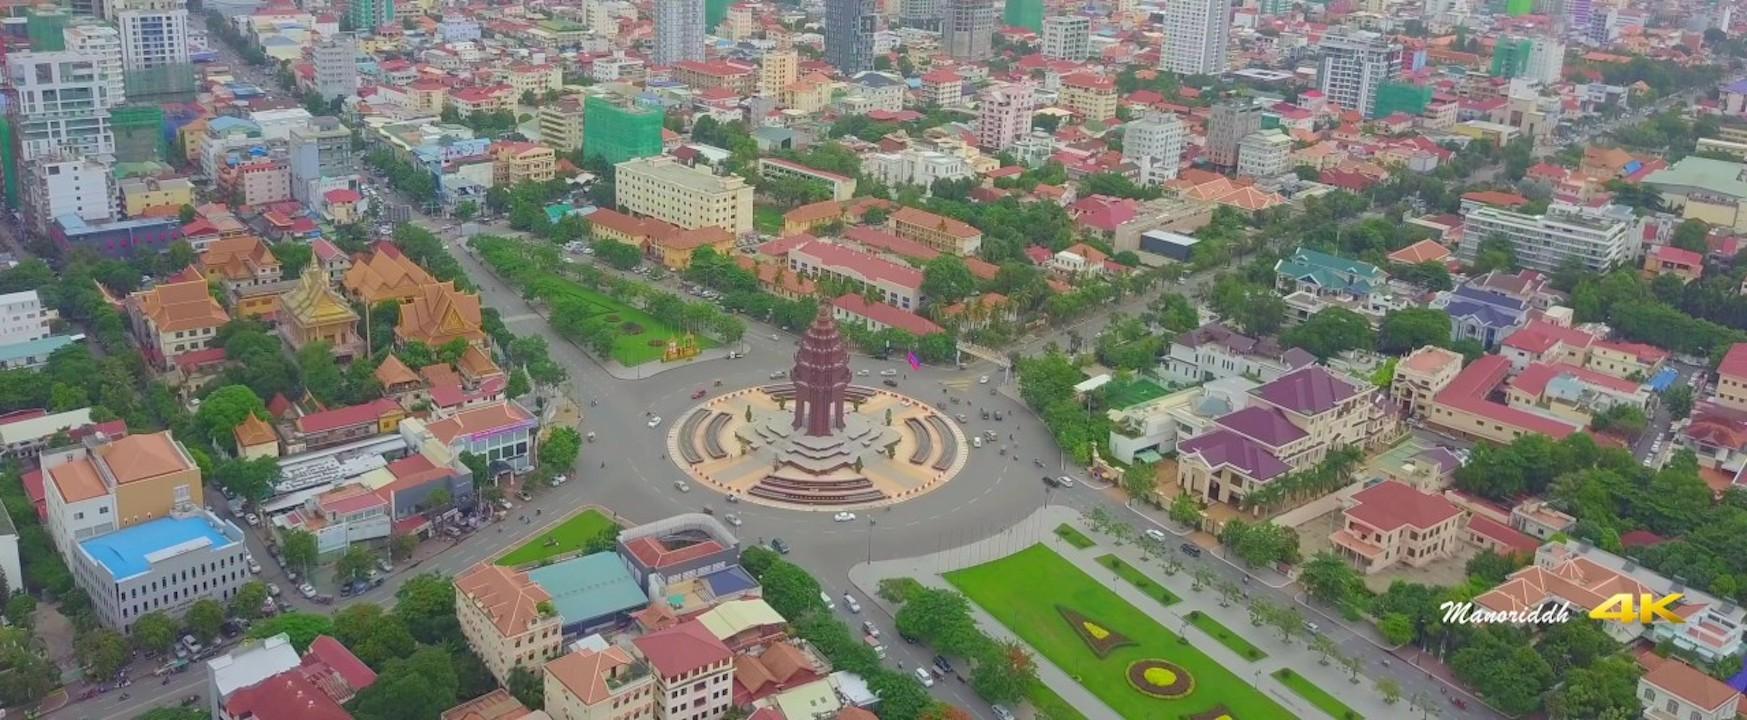 4 Day Phnom Penh Free & Easy (DeLuxe) 16/09/18 <> 19/12/18